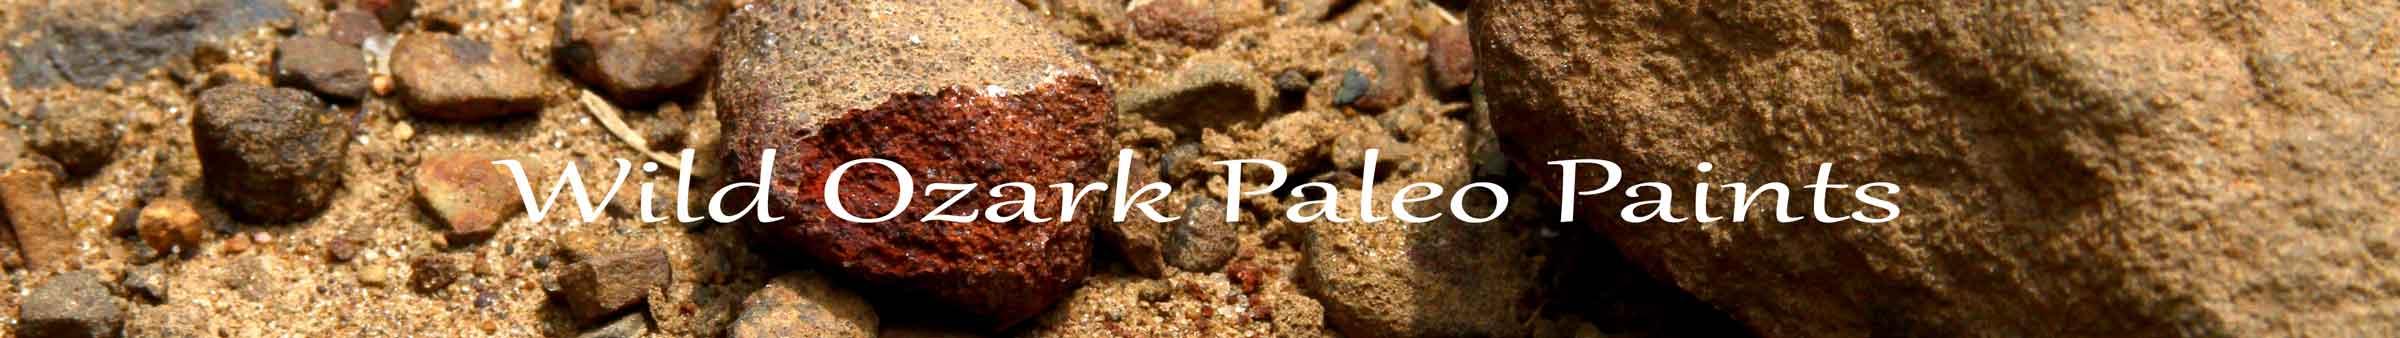 Banner for Wild Ozark Paleo Paints